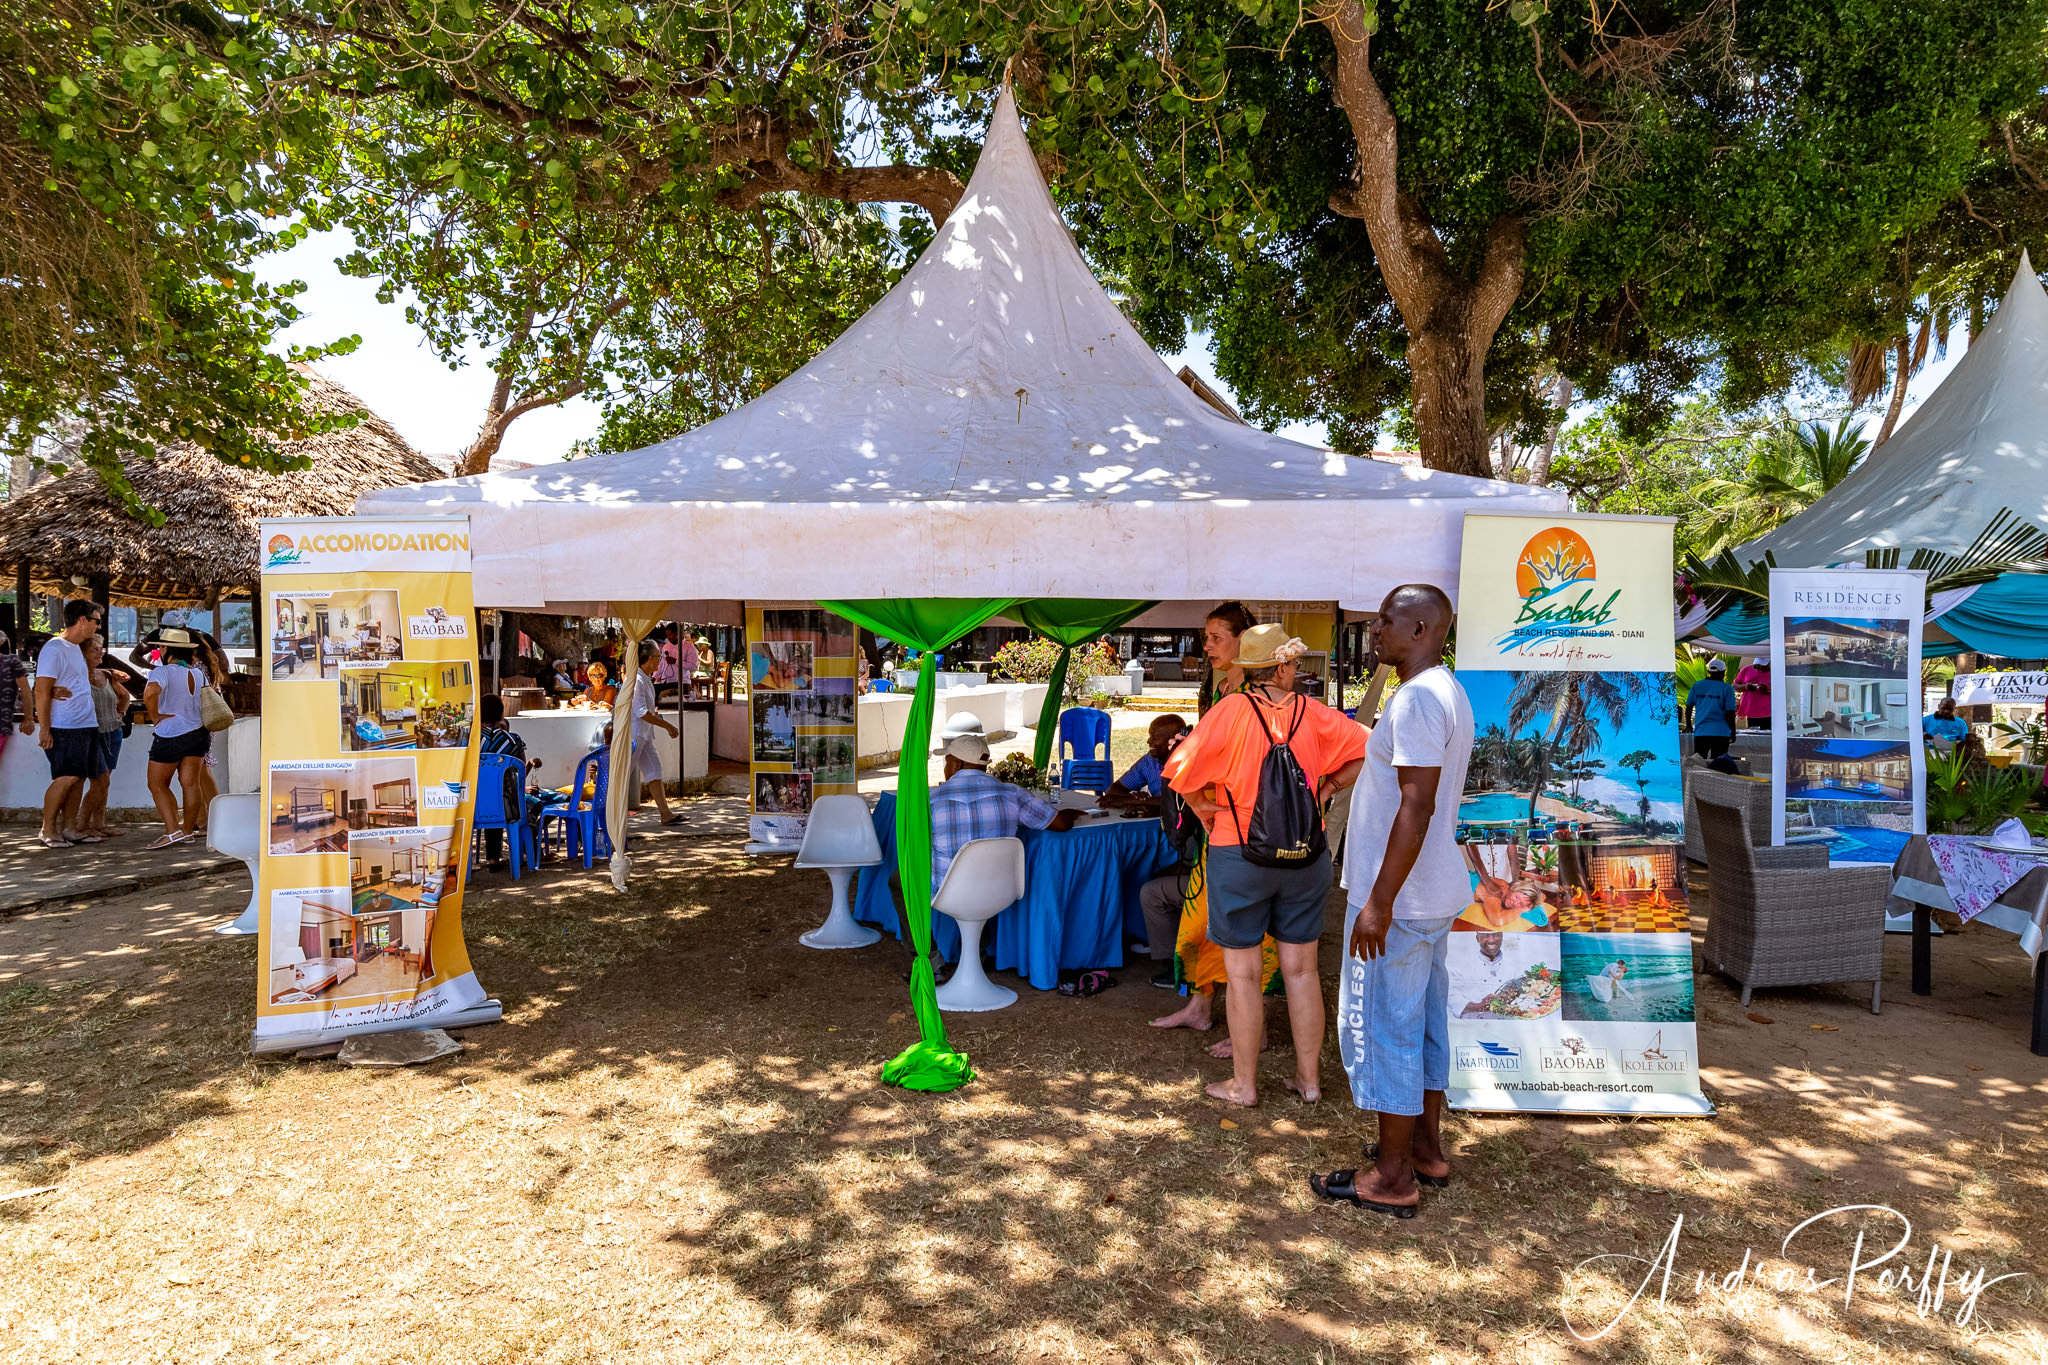 Baobab hospitality tent at Diani regatta